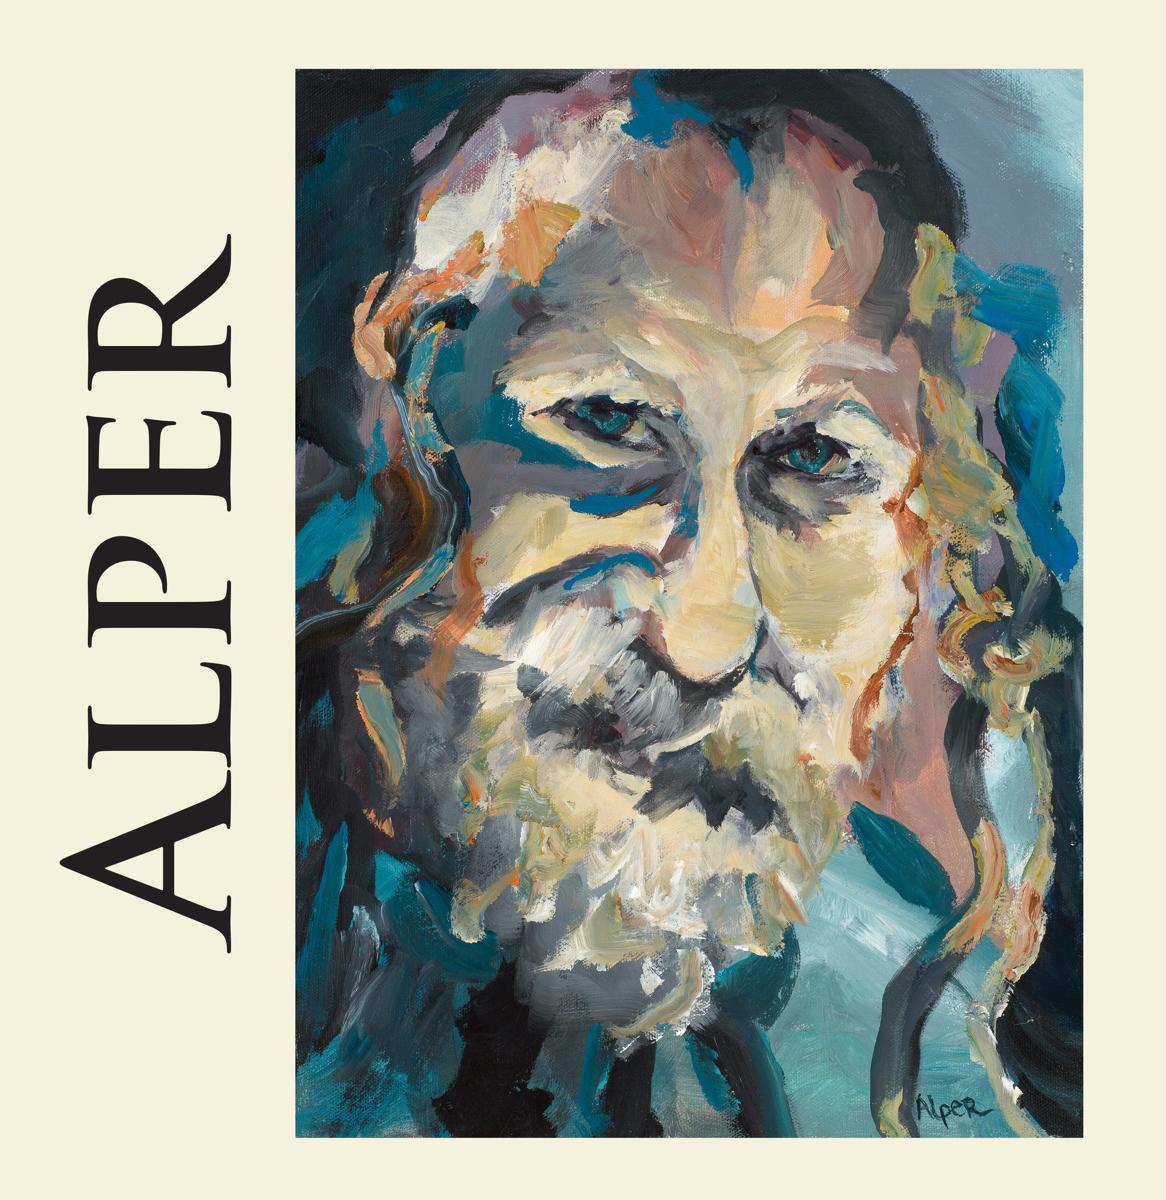 Alper Art Book (large view)